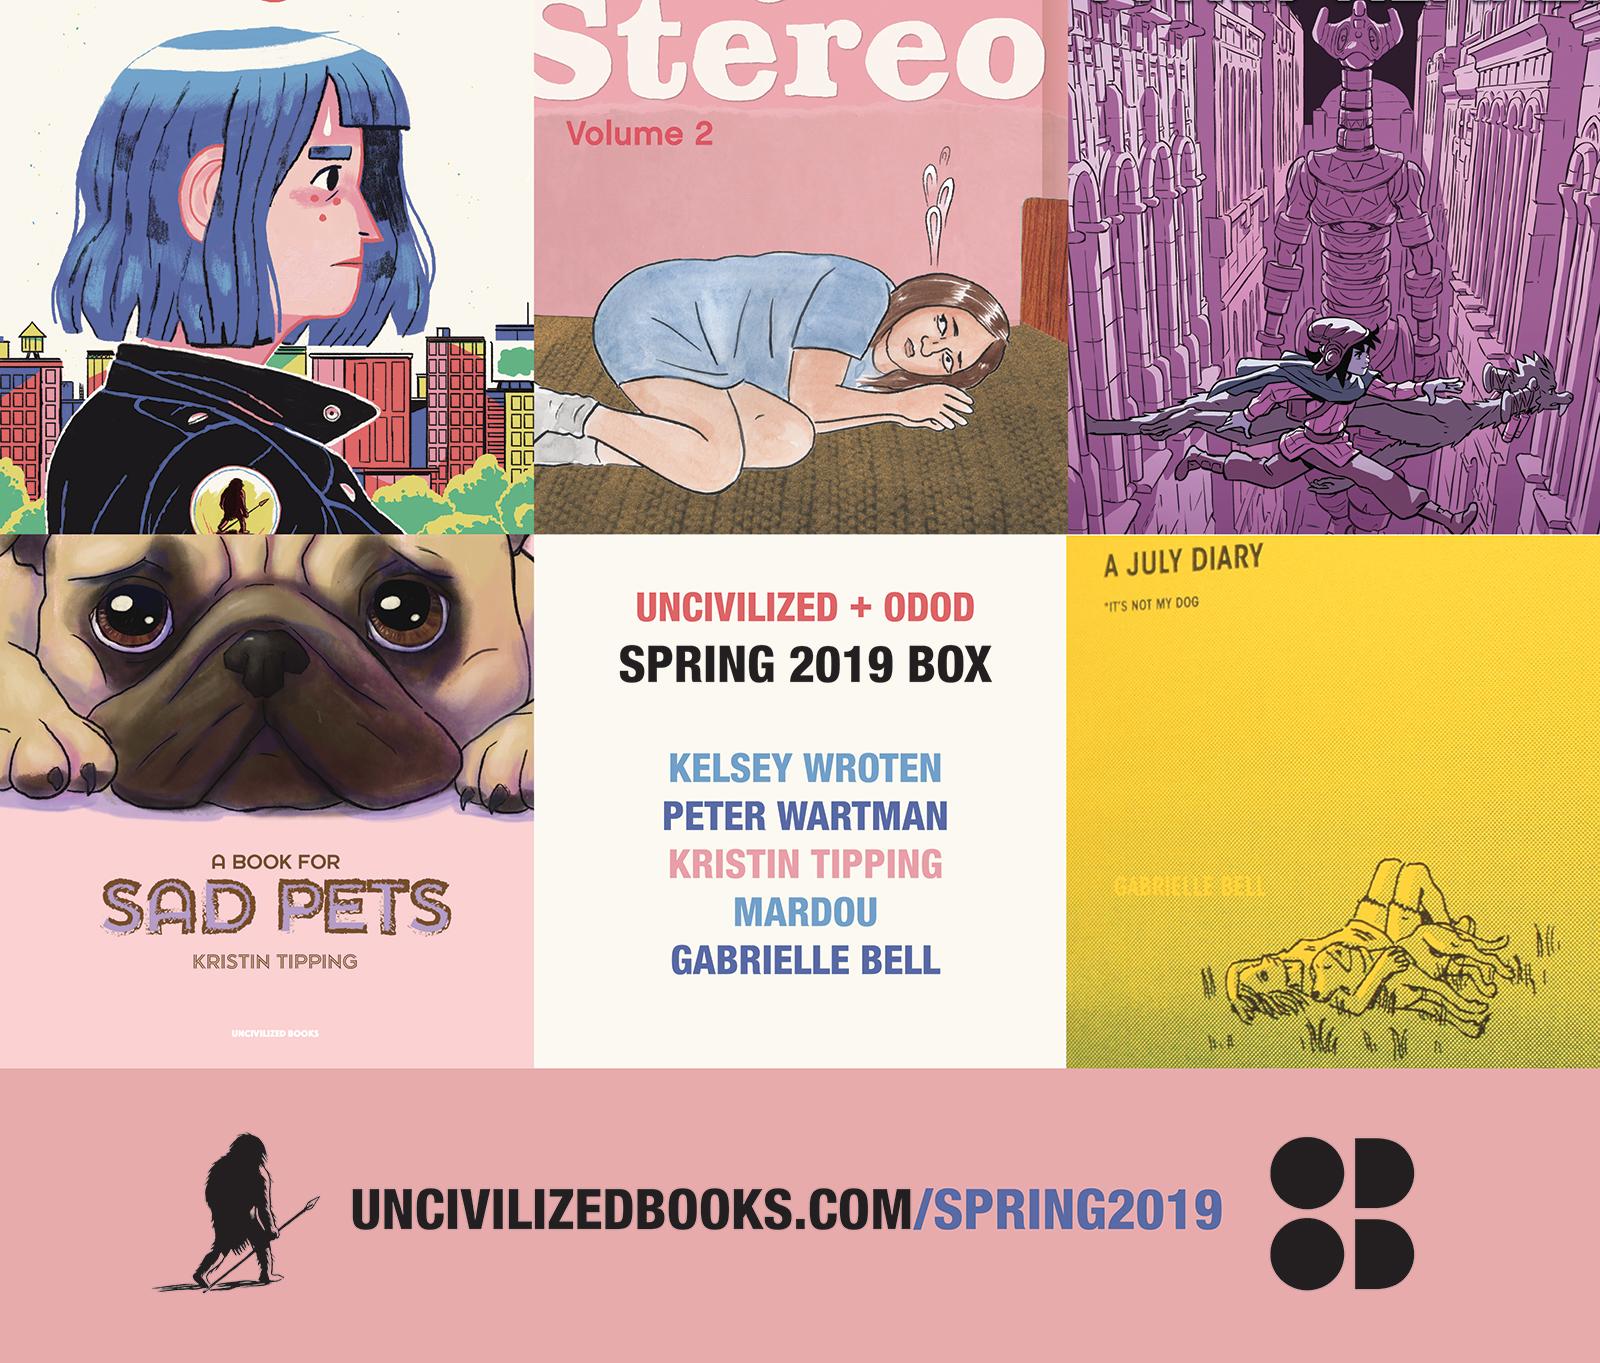 Spring 2019 Box | Uncivilized Books Subscription